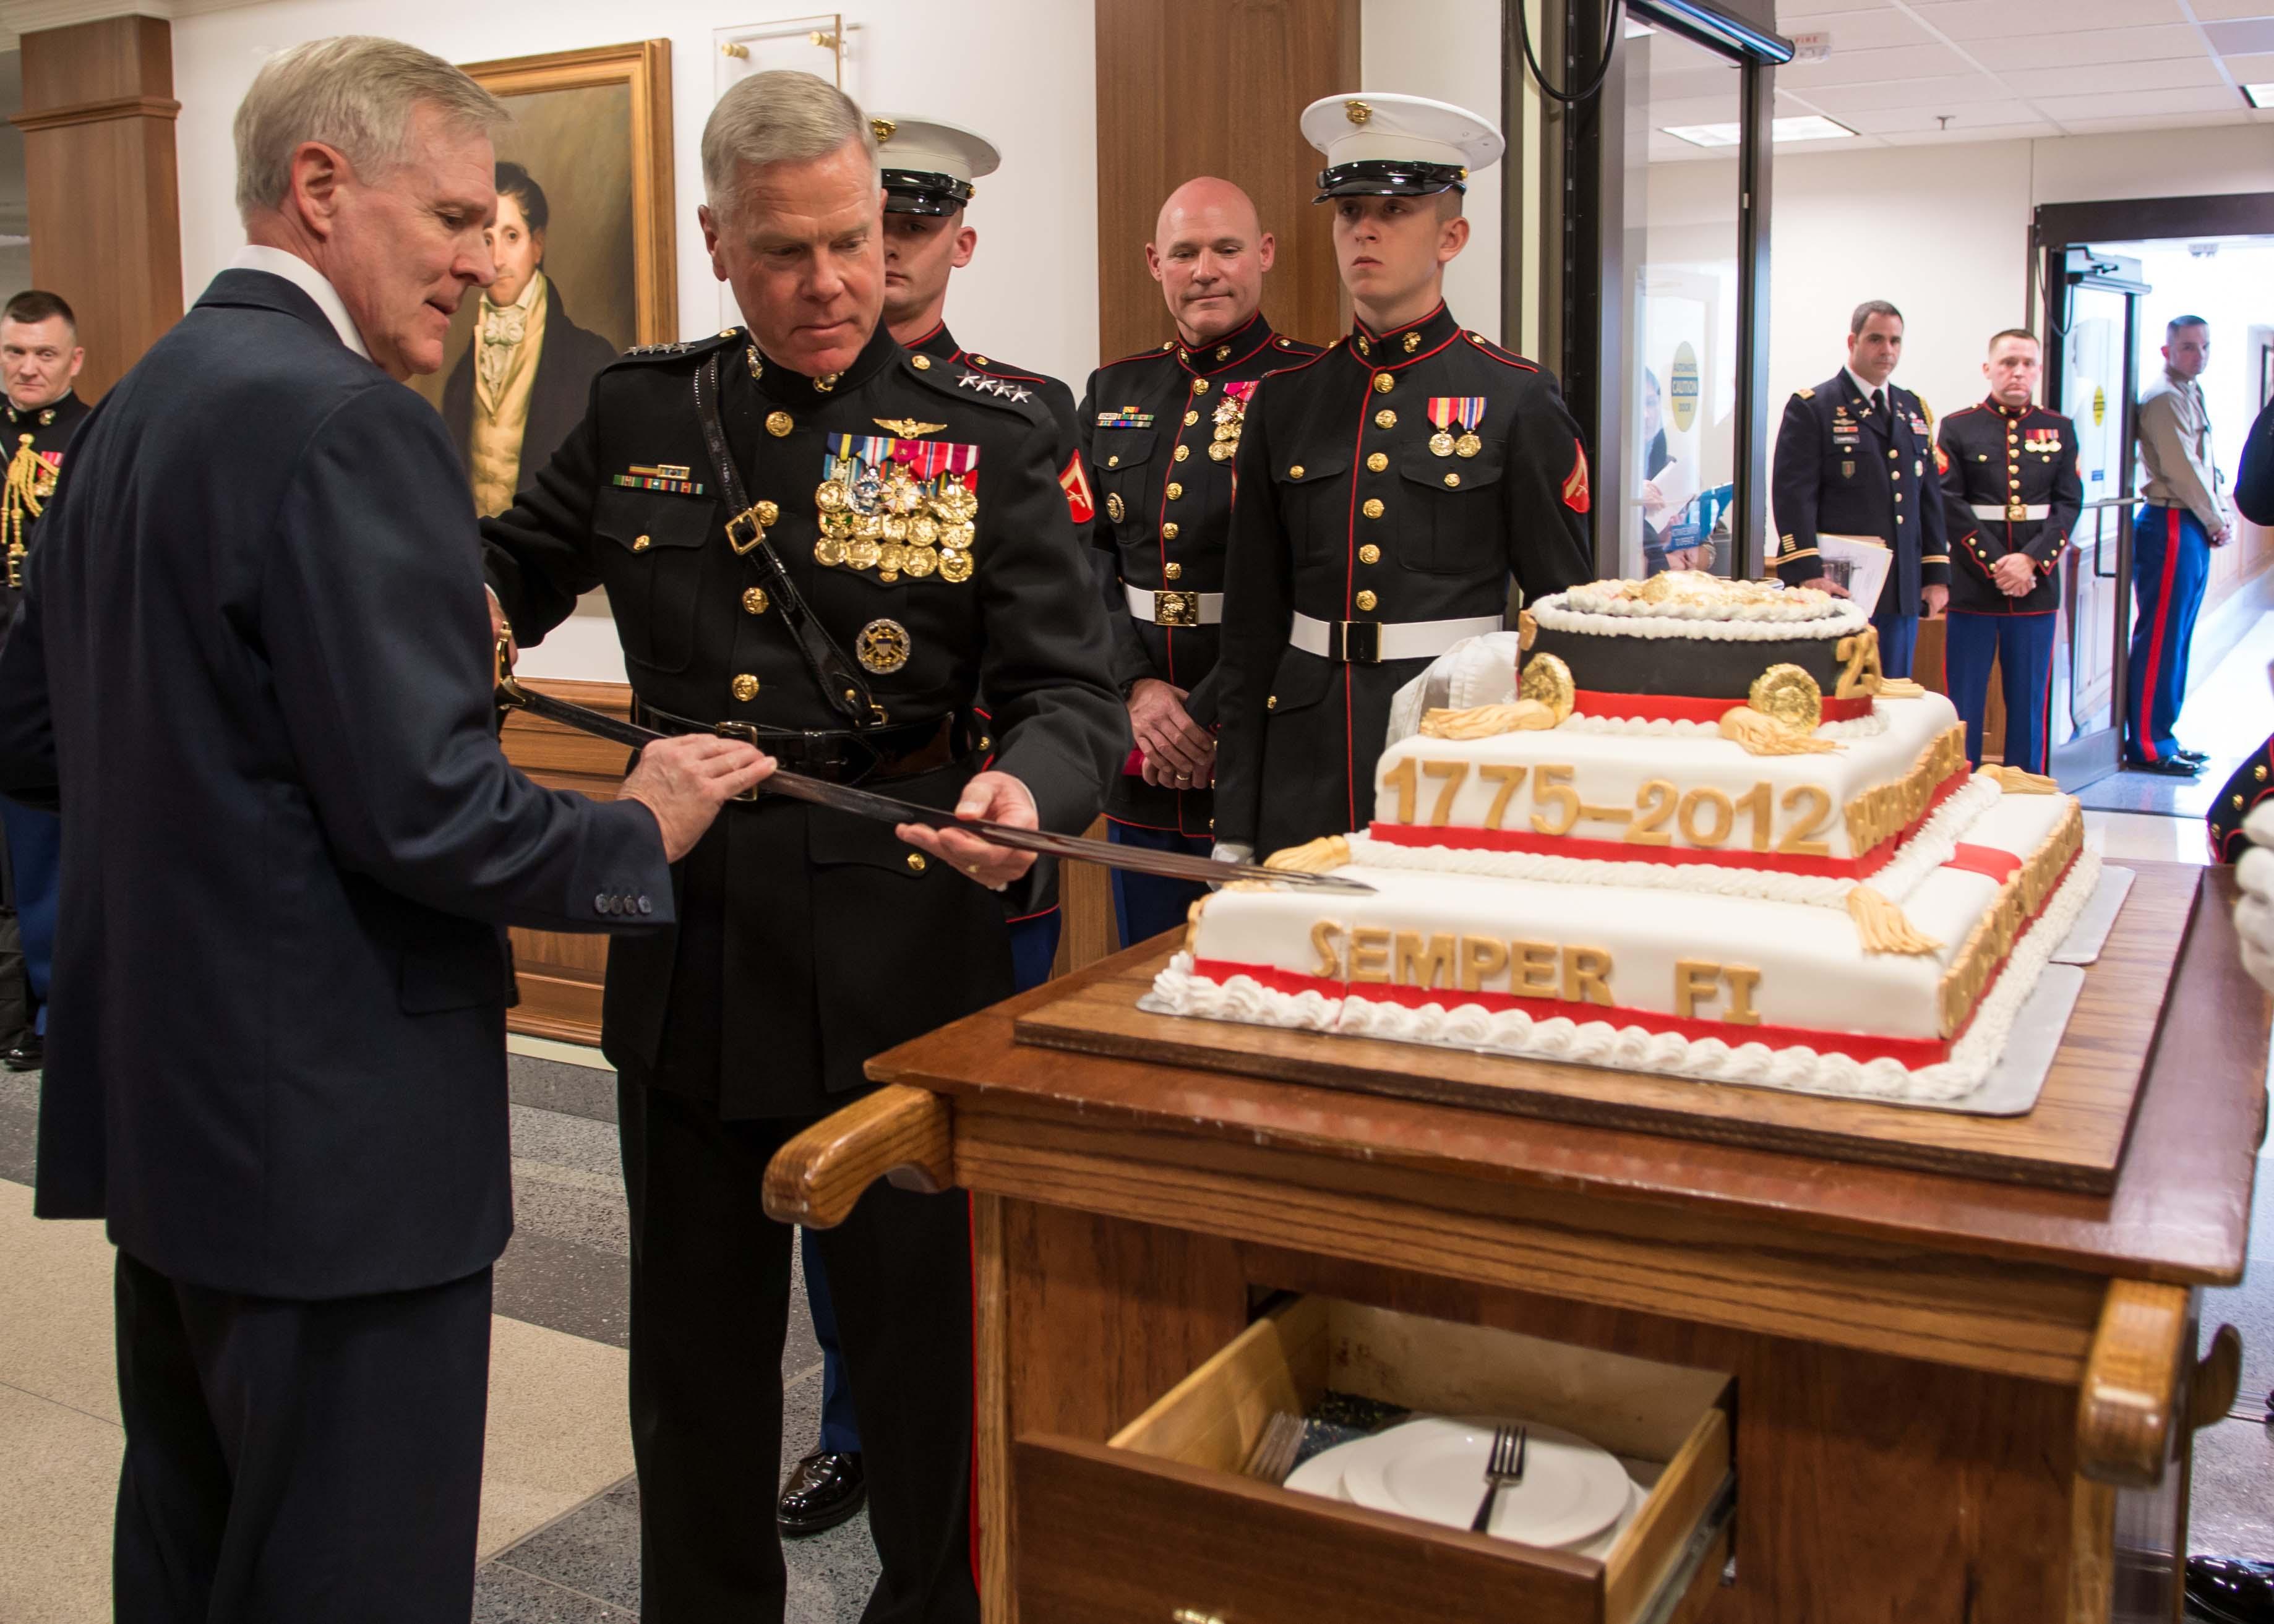 Usmc Birthday Cake Cutting Mattis